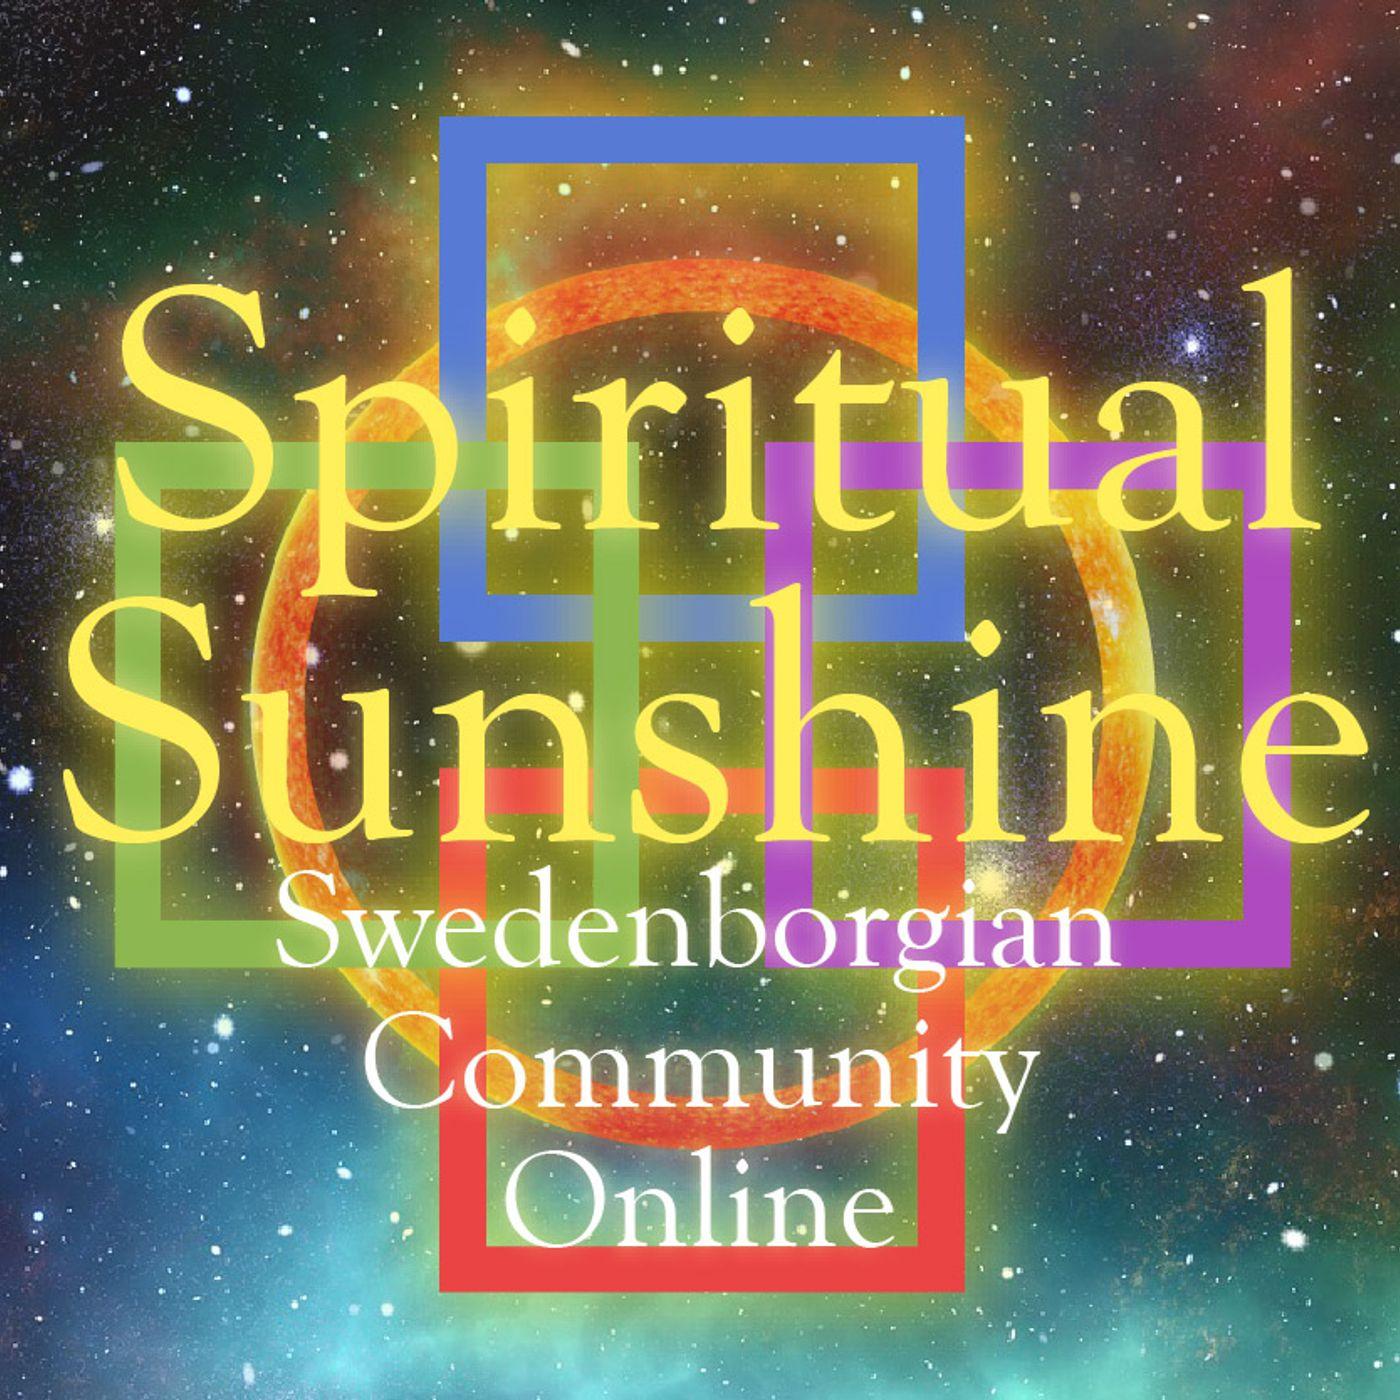 Swedenborgian Community Online